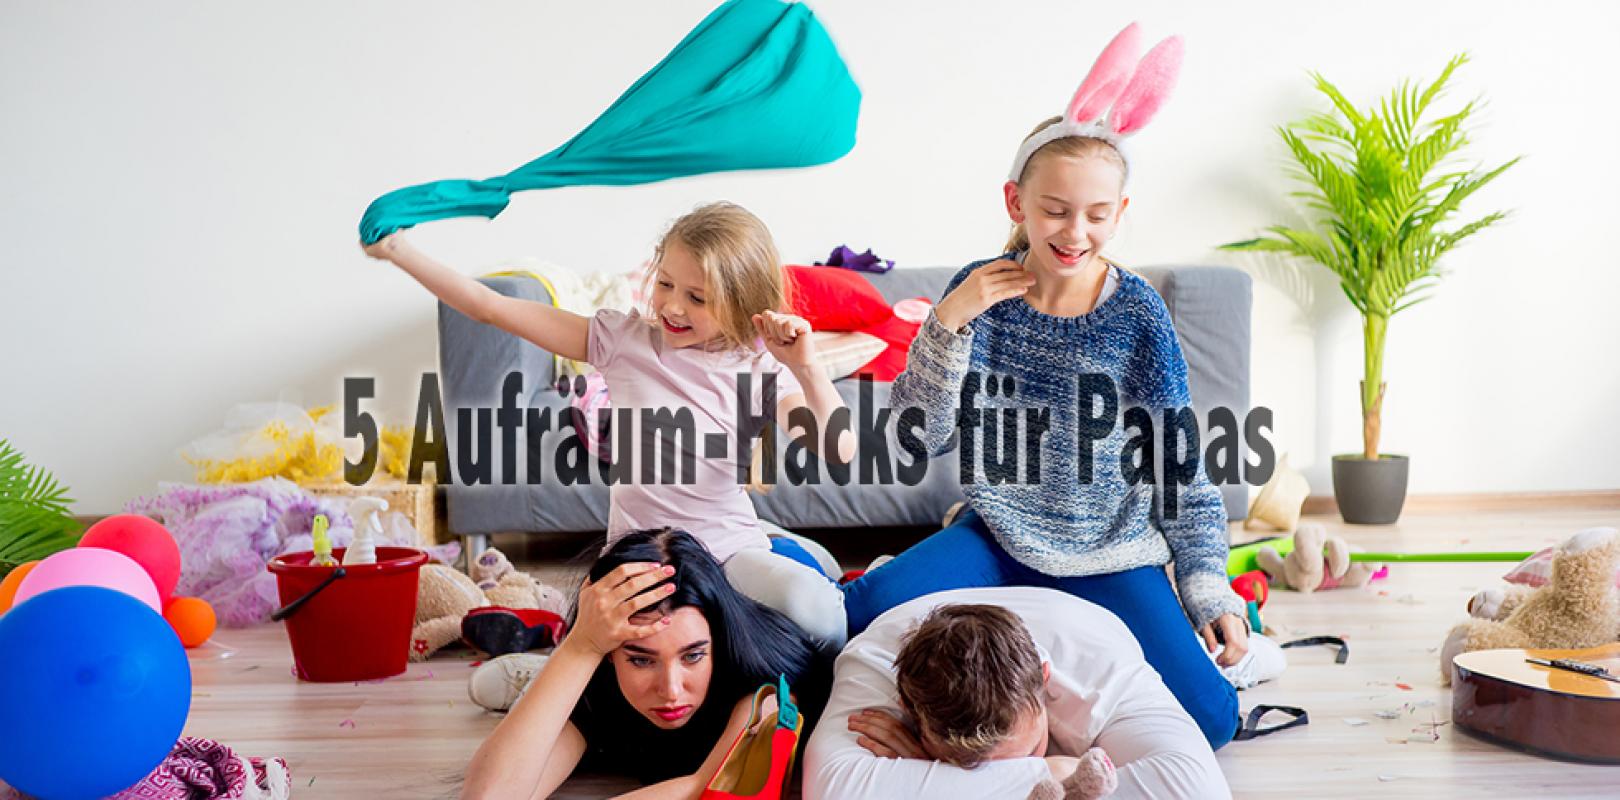 kinderzimmer aufr umen 5 aufr um hacks f r papas. Black Bedroom Furniture Sets. Home Design Ideas